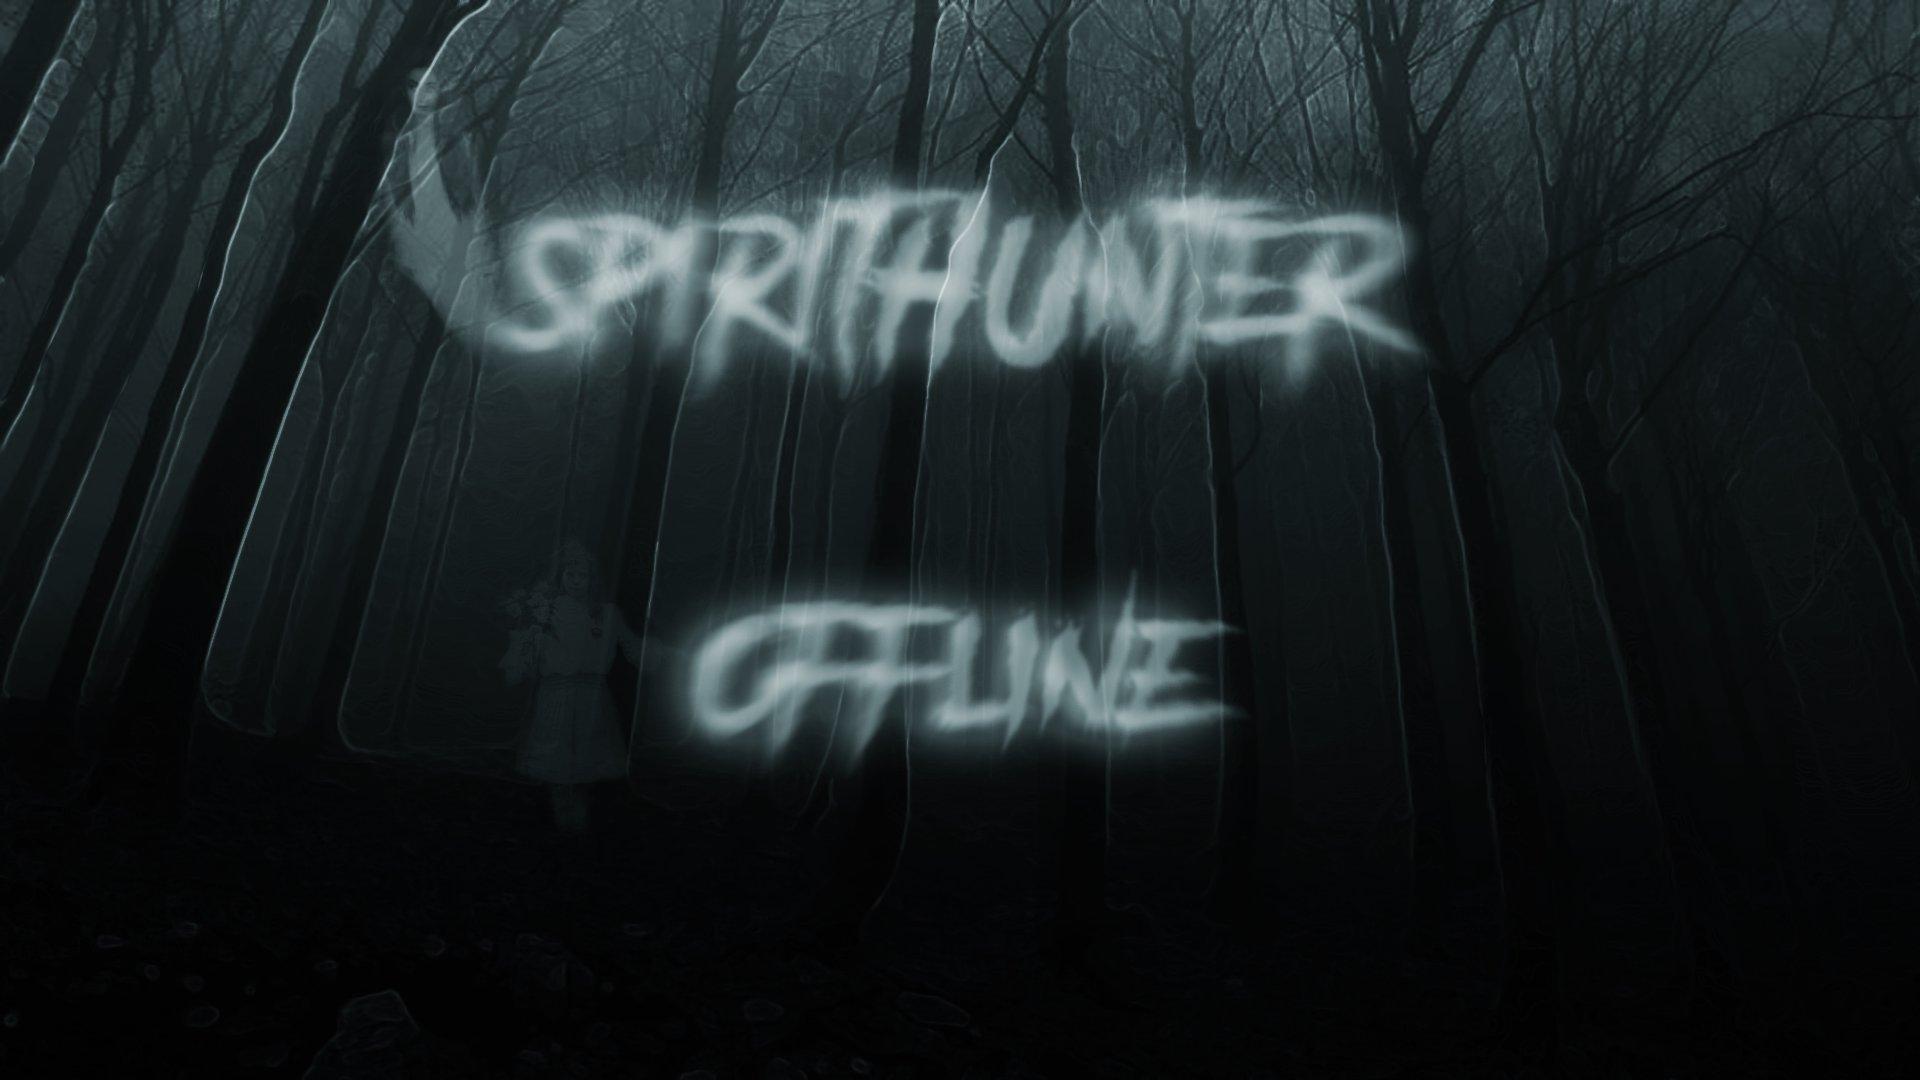 Twitch stream of spirithunter